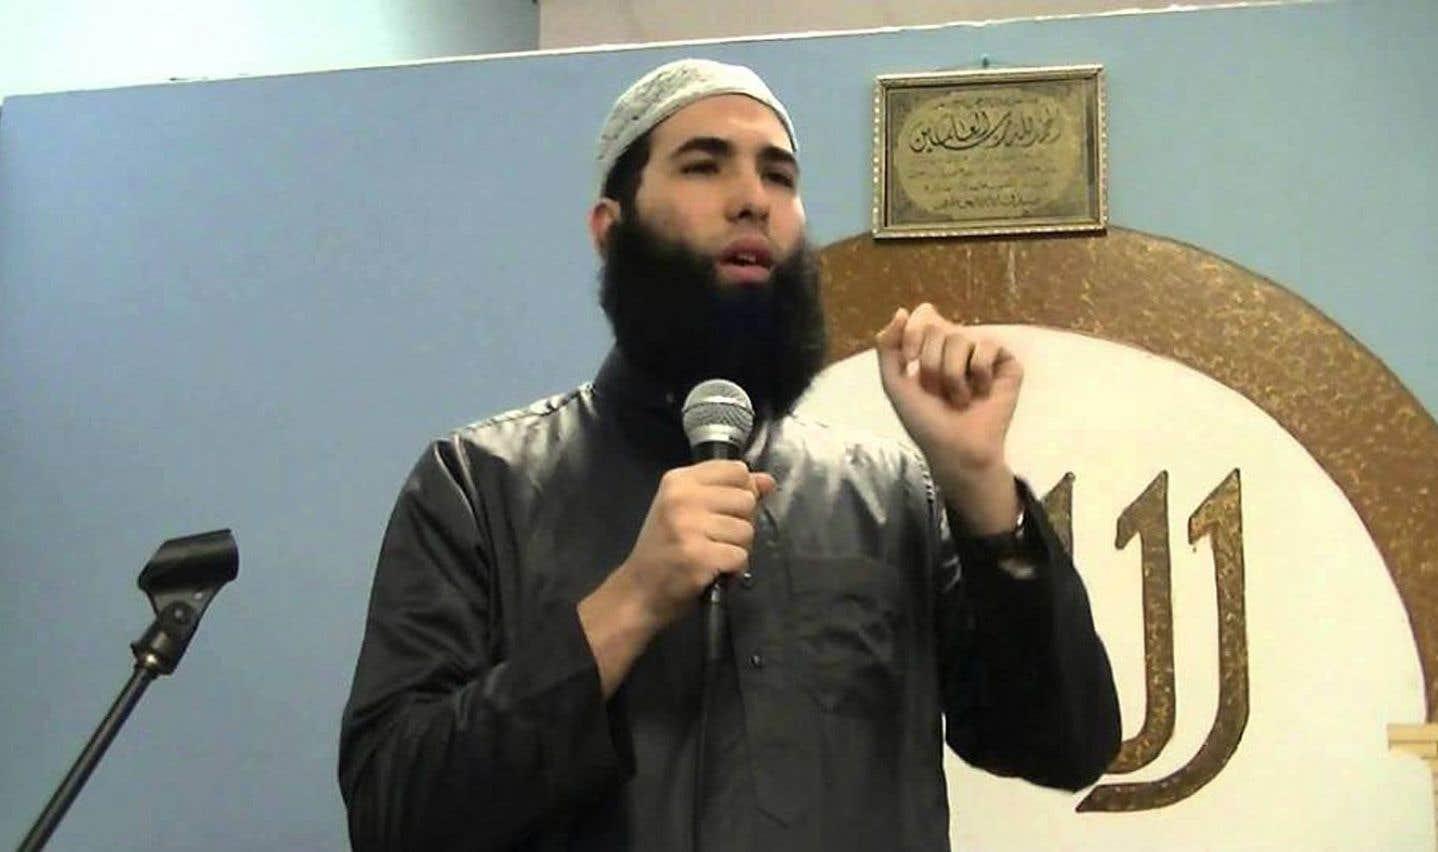 Un imam intégriste choque Weil